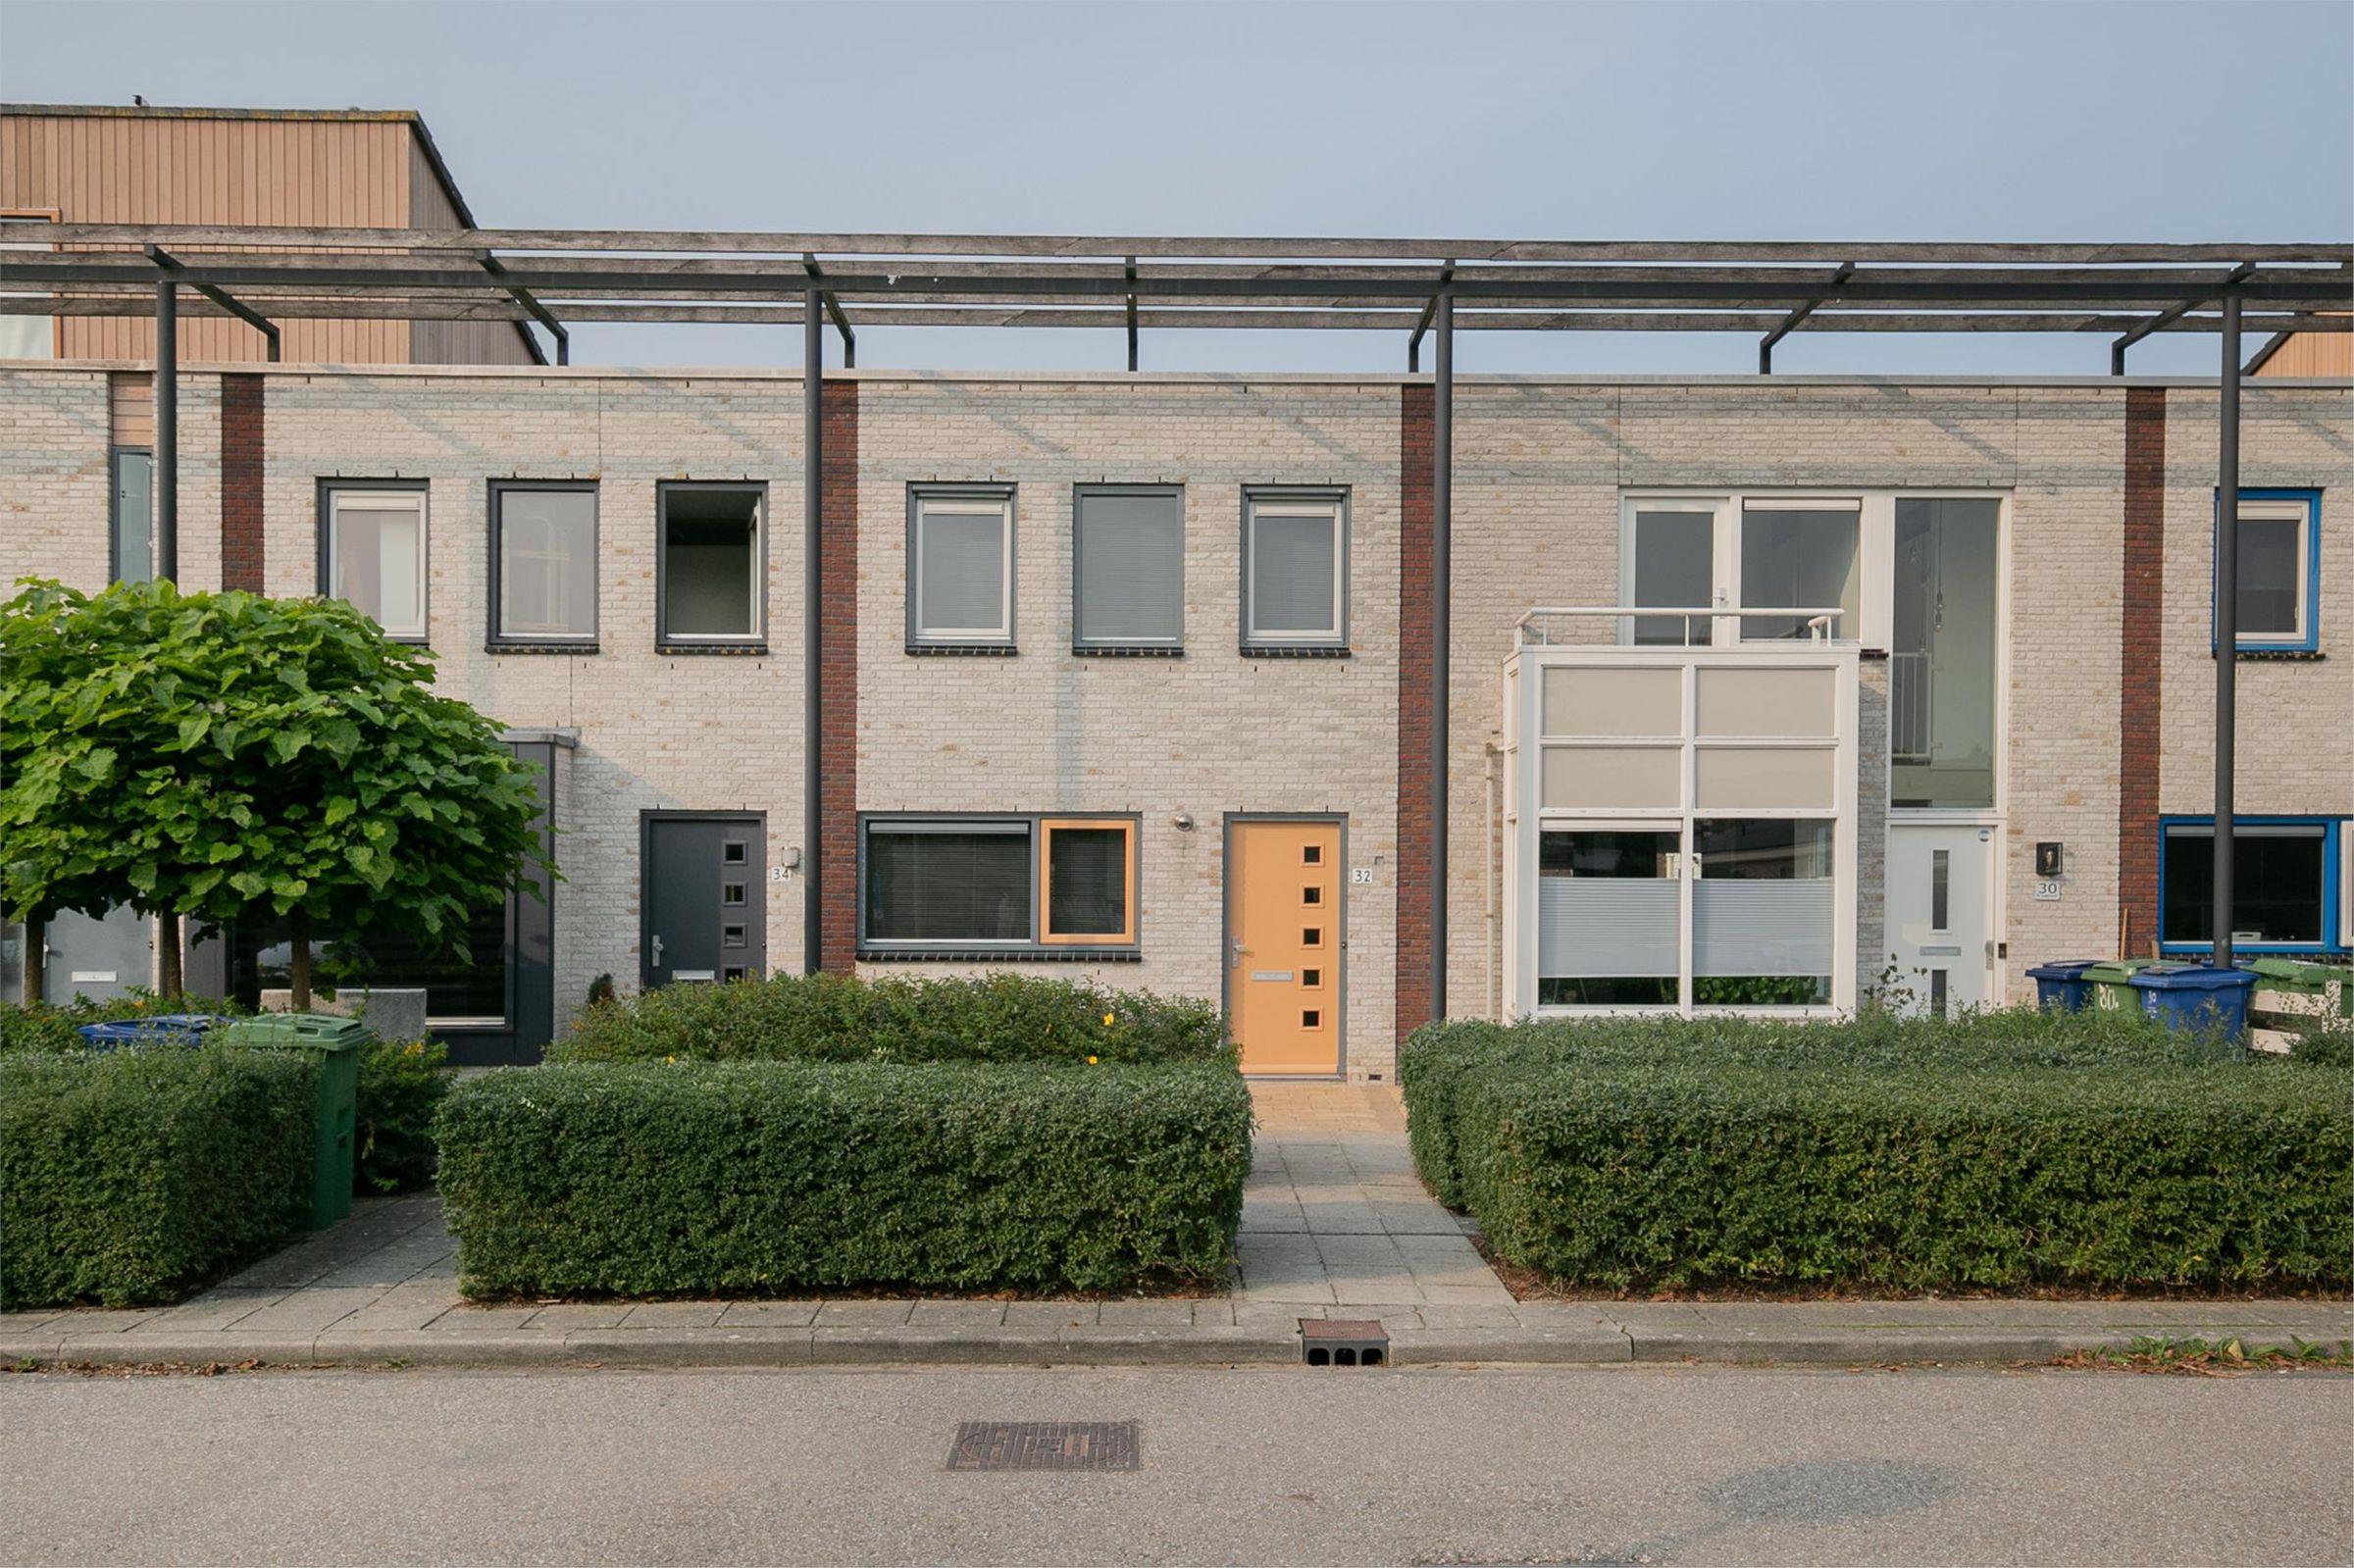 Goyastraat 32, Almere